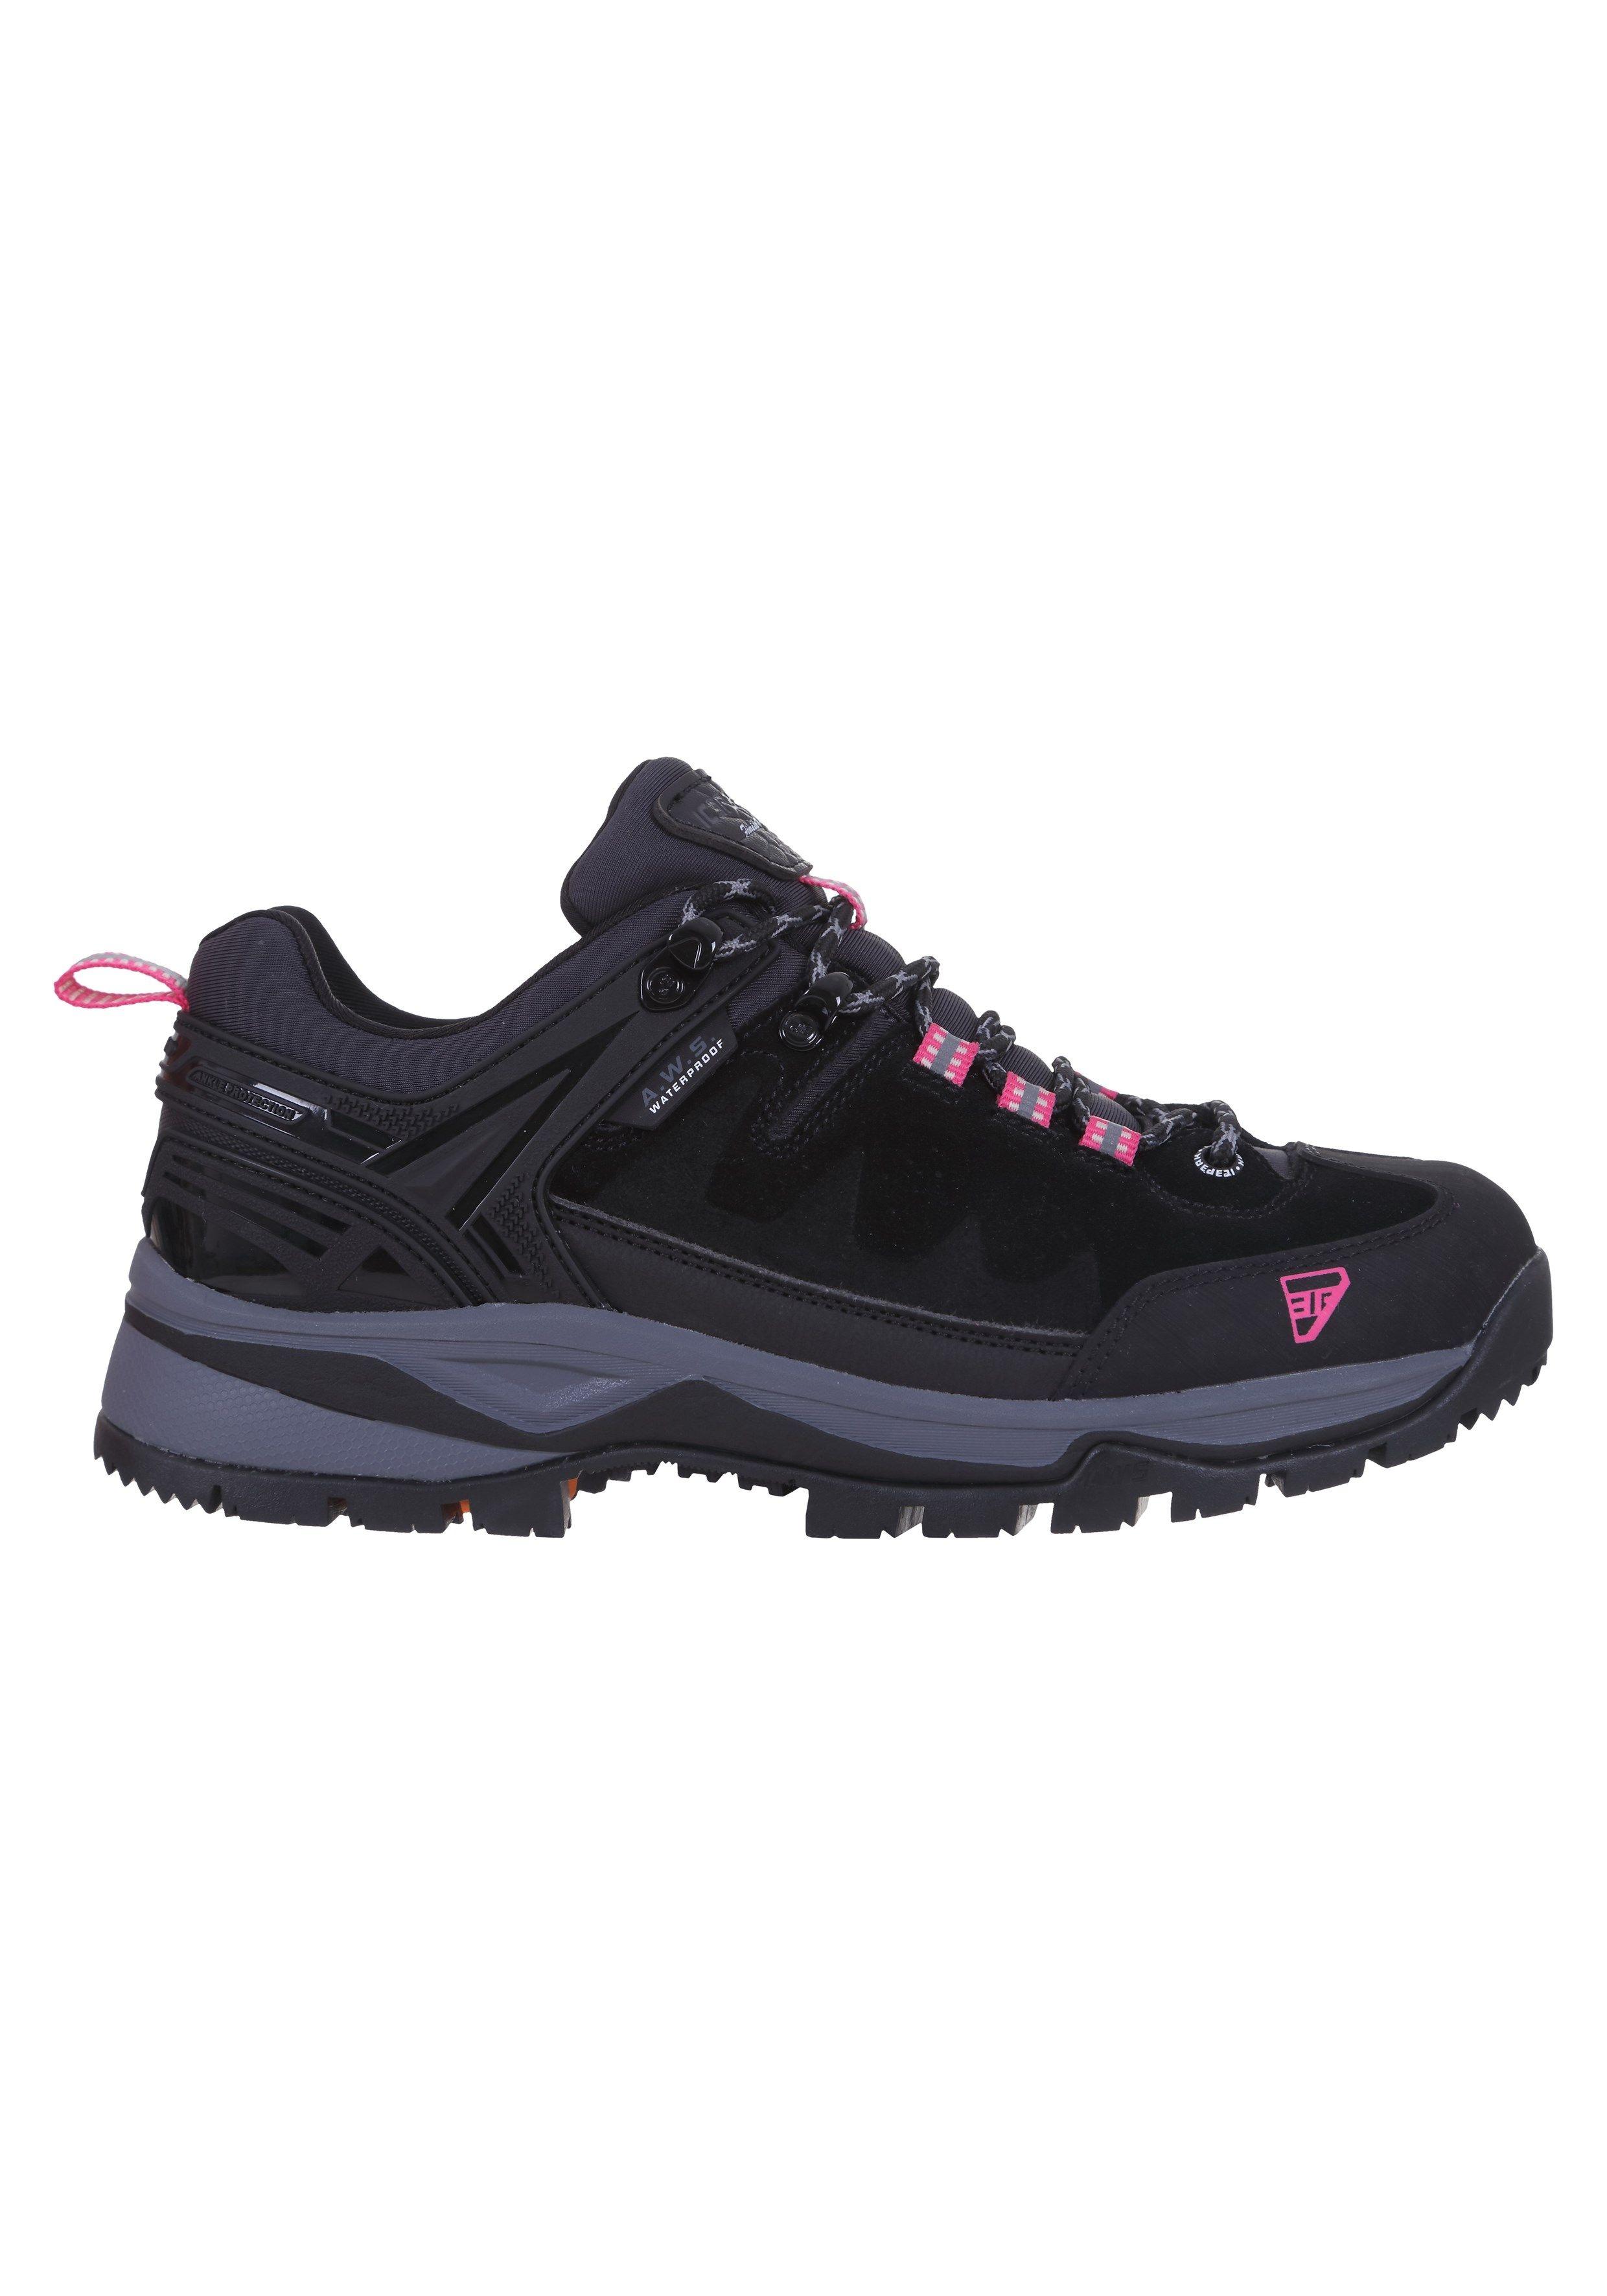 Icepeak Damen Wanderschuh Wyot Ms 75259 schwarz pink